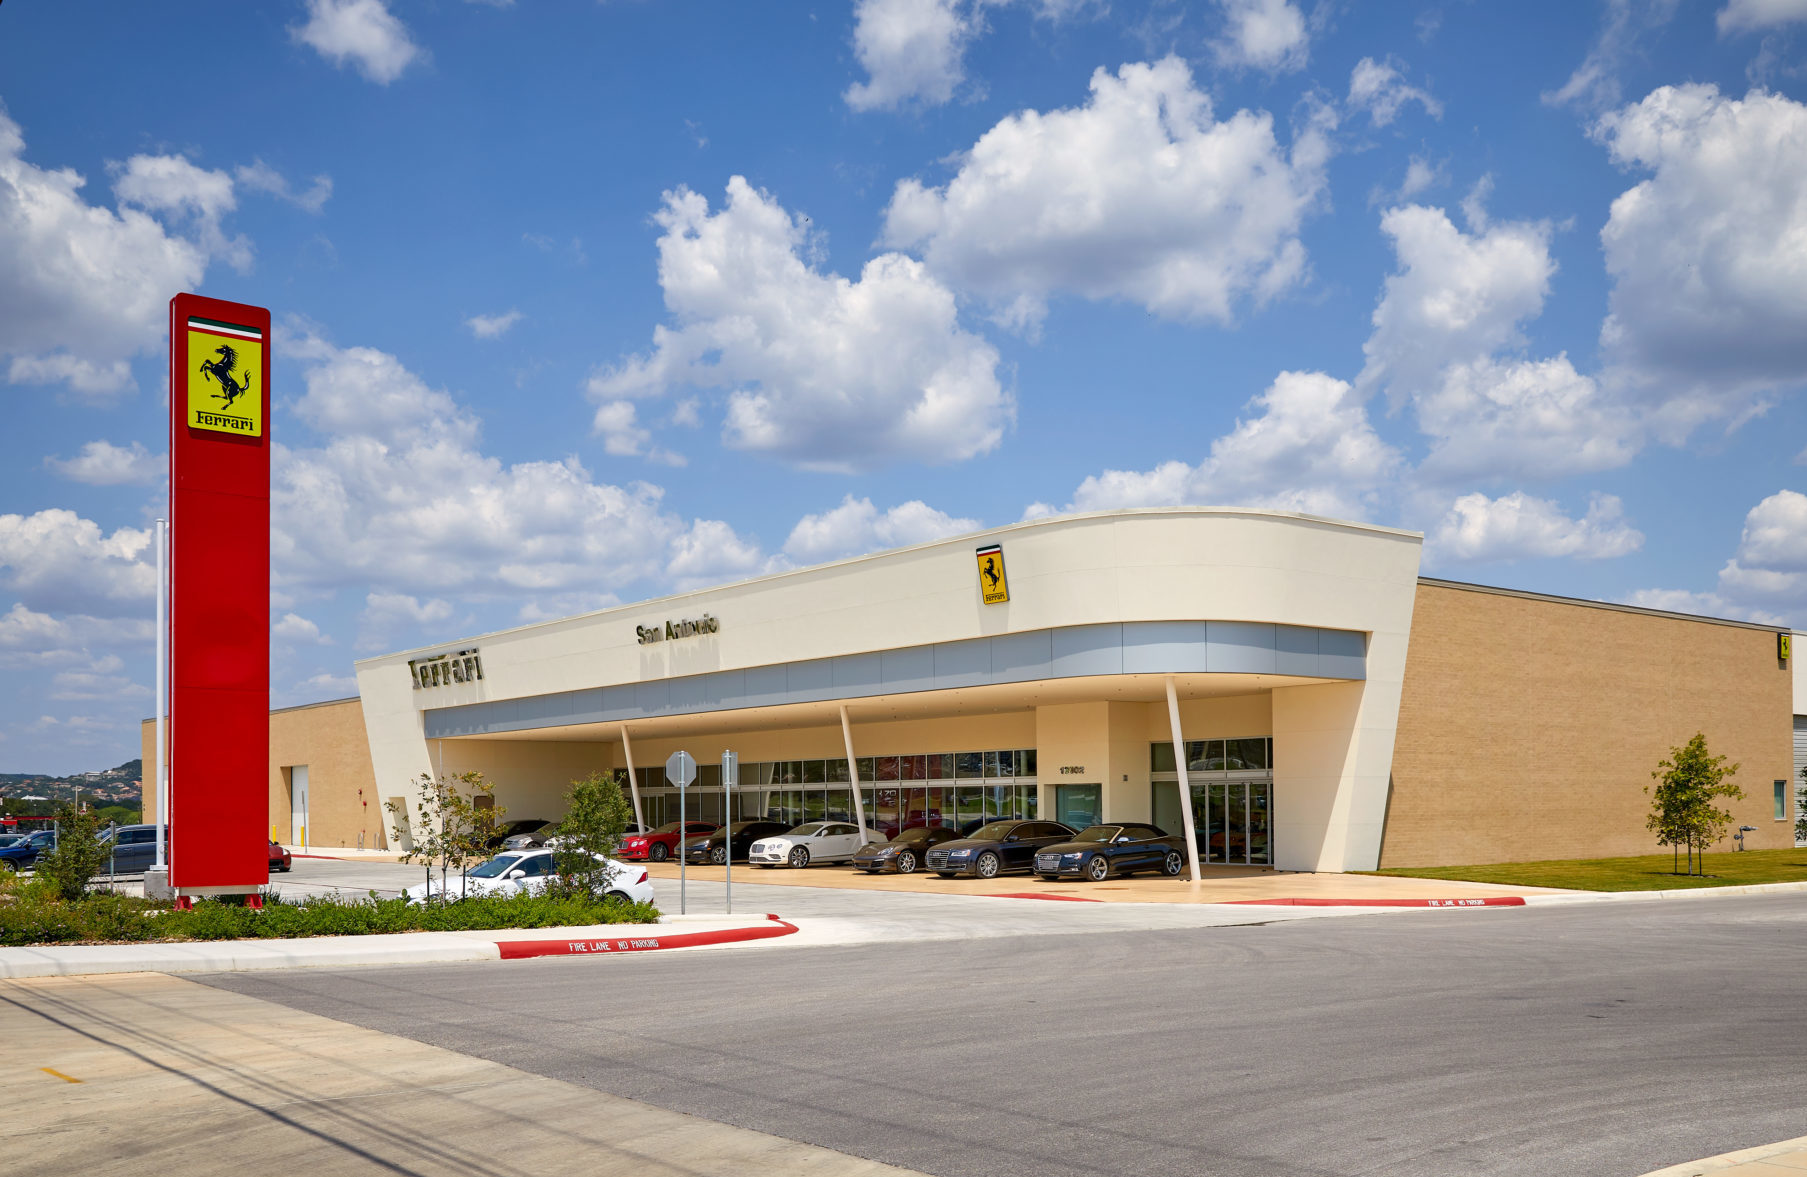 Ferrari Dealership San Antonio Joeris General Contractors